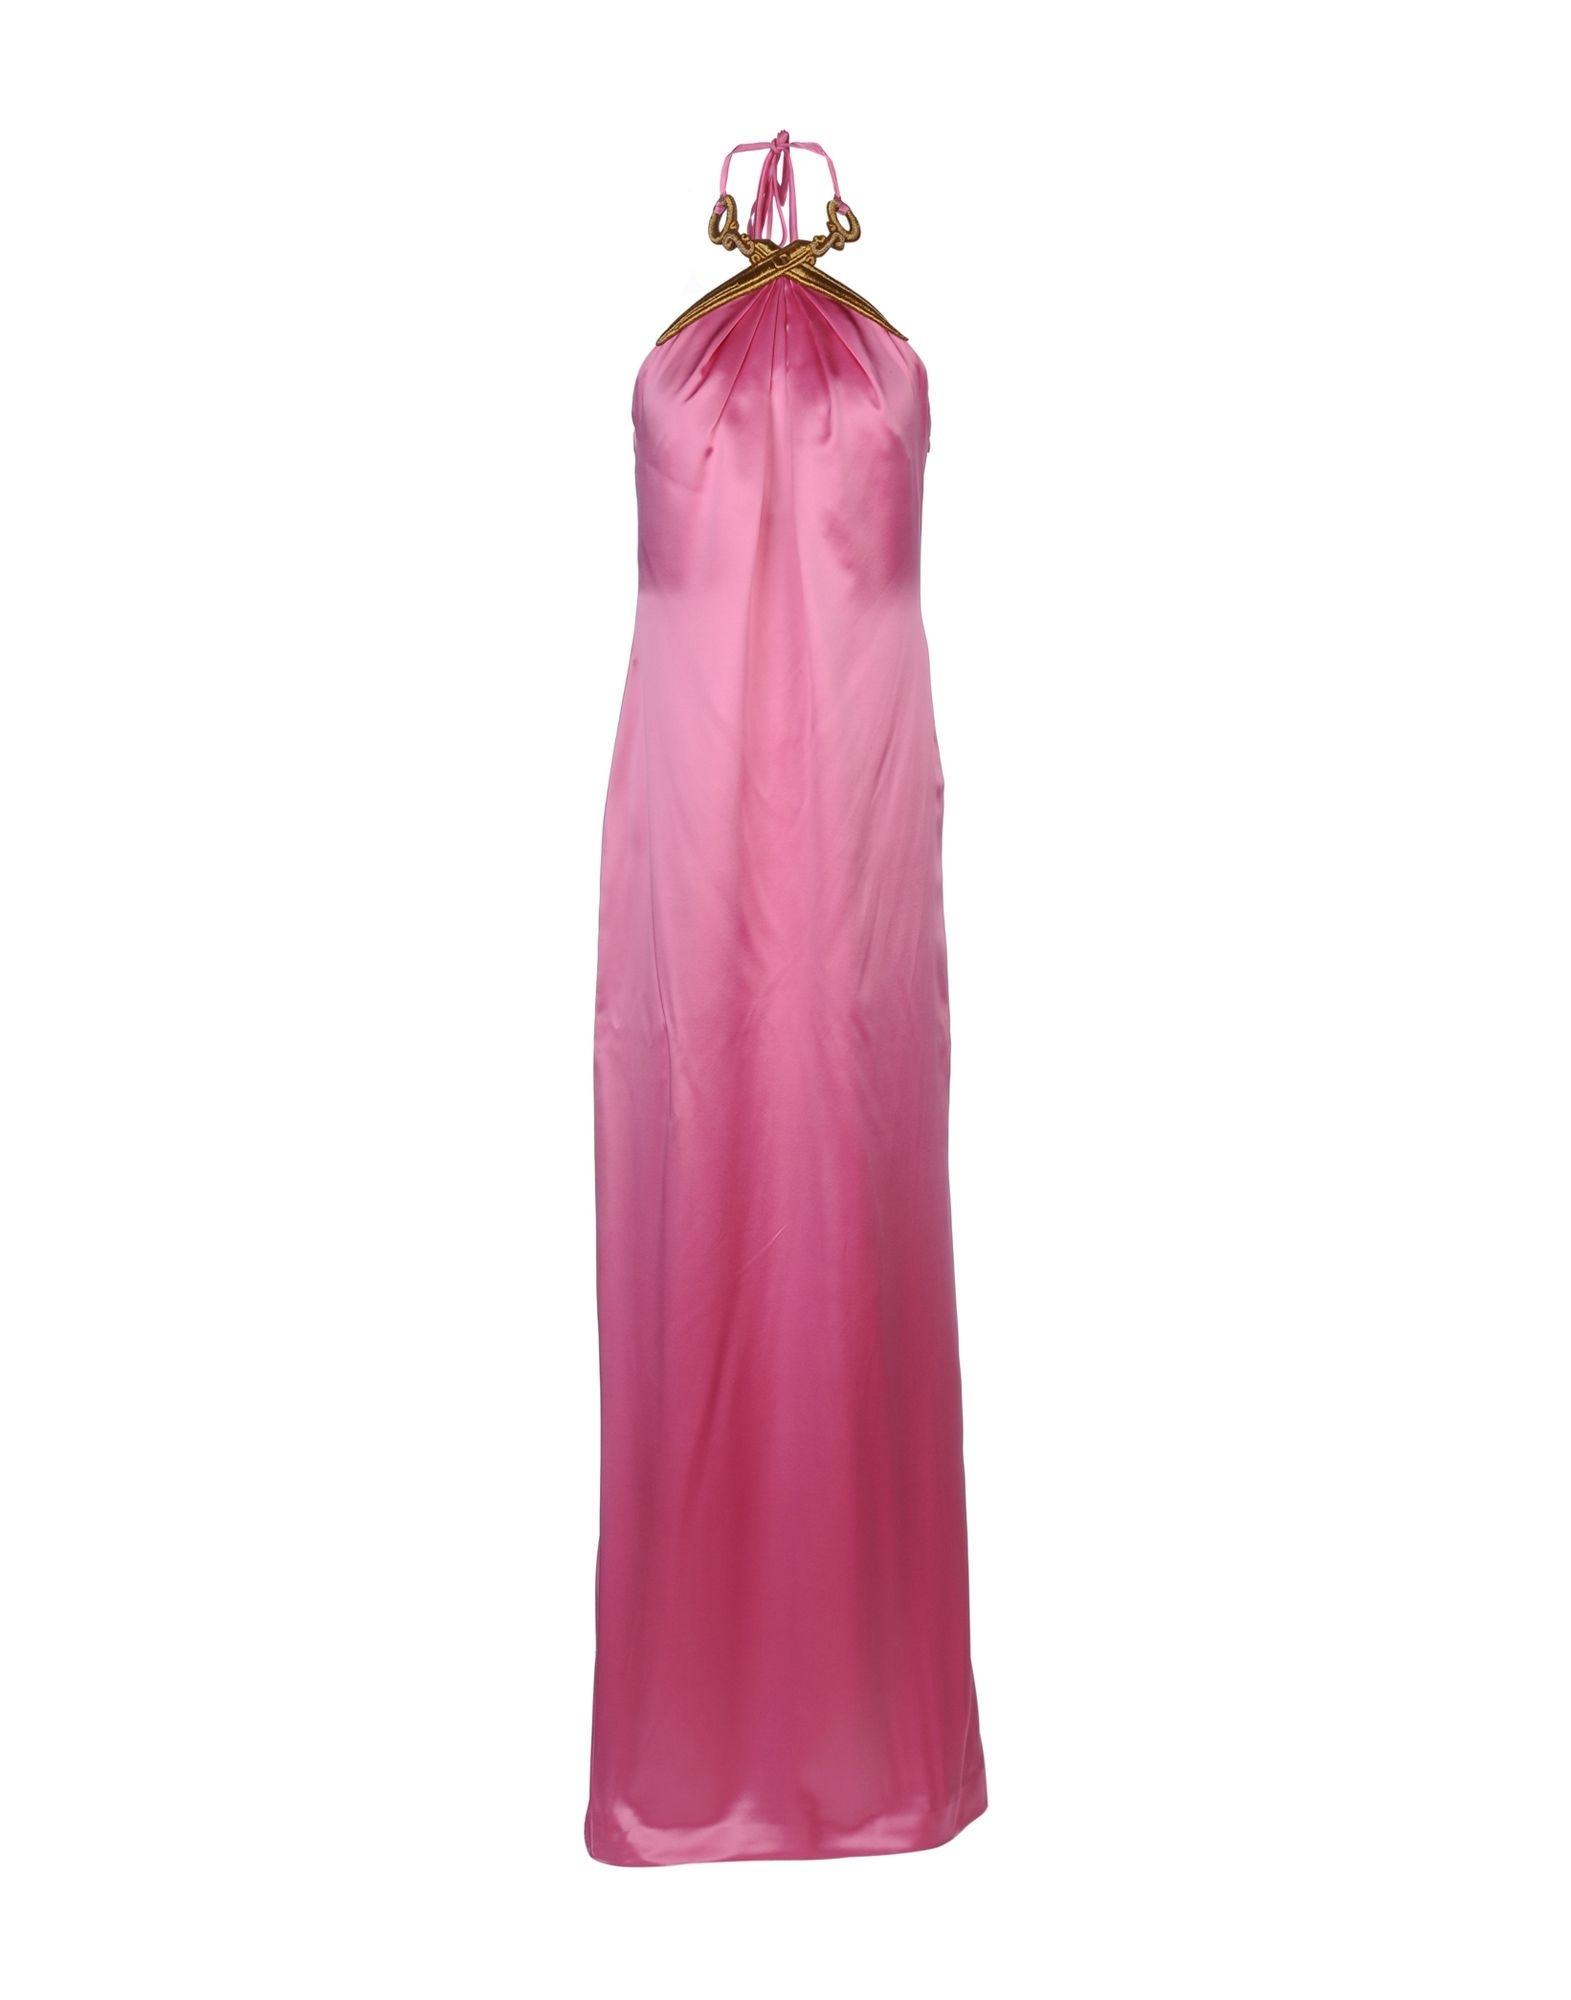 10 Fantastisch Abendkleid Billig Ärmel20 Perfekt Abendkleid Billig Vertrieb